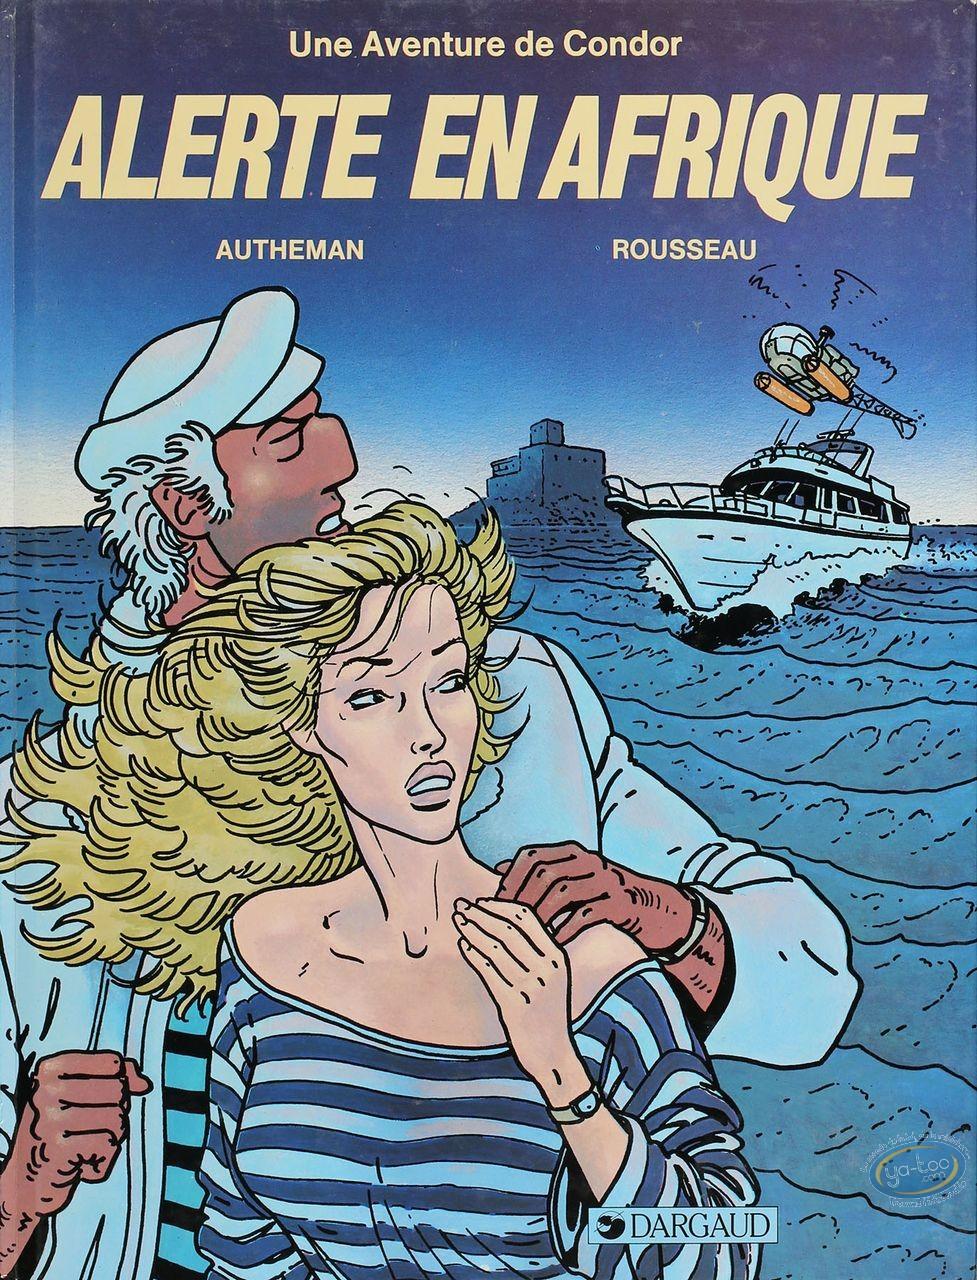 Listed European Comic Books, Condor : Alerte en Afrique (good condition)